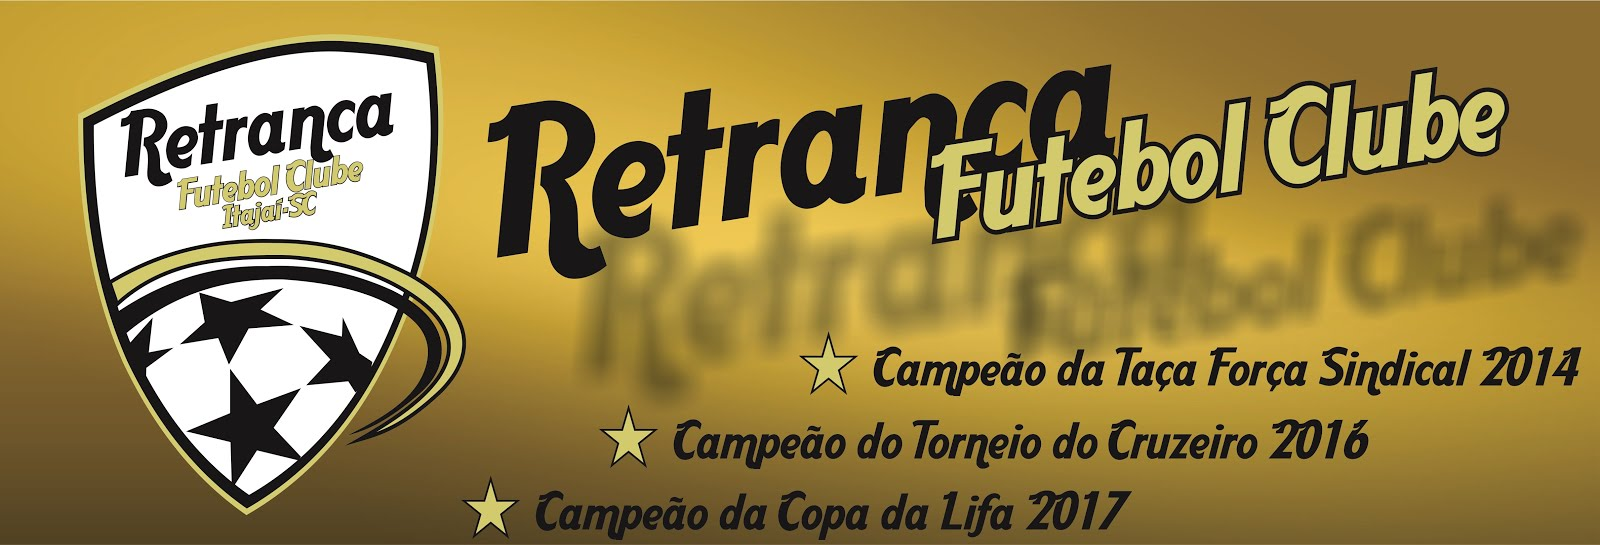 RETRANCA FUTEBOL CLUBE